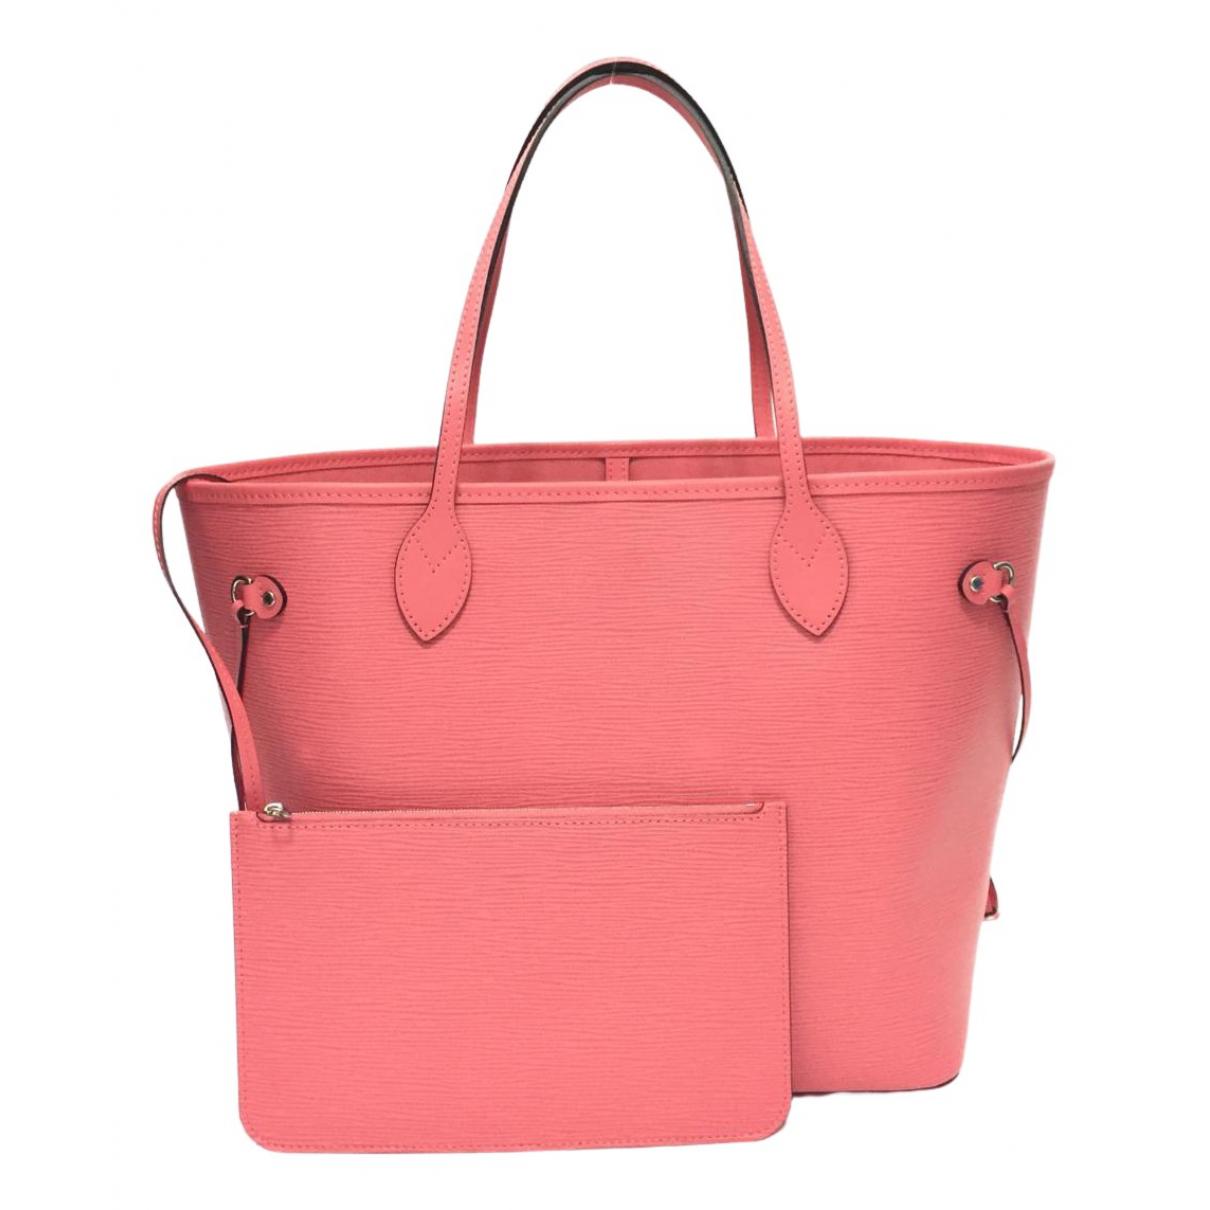 Louis Vuitton - Sac a main Neverfull pour femme en cuir - rose